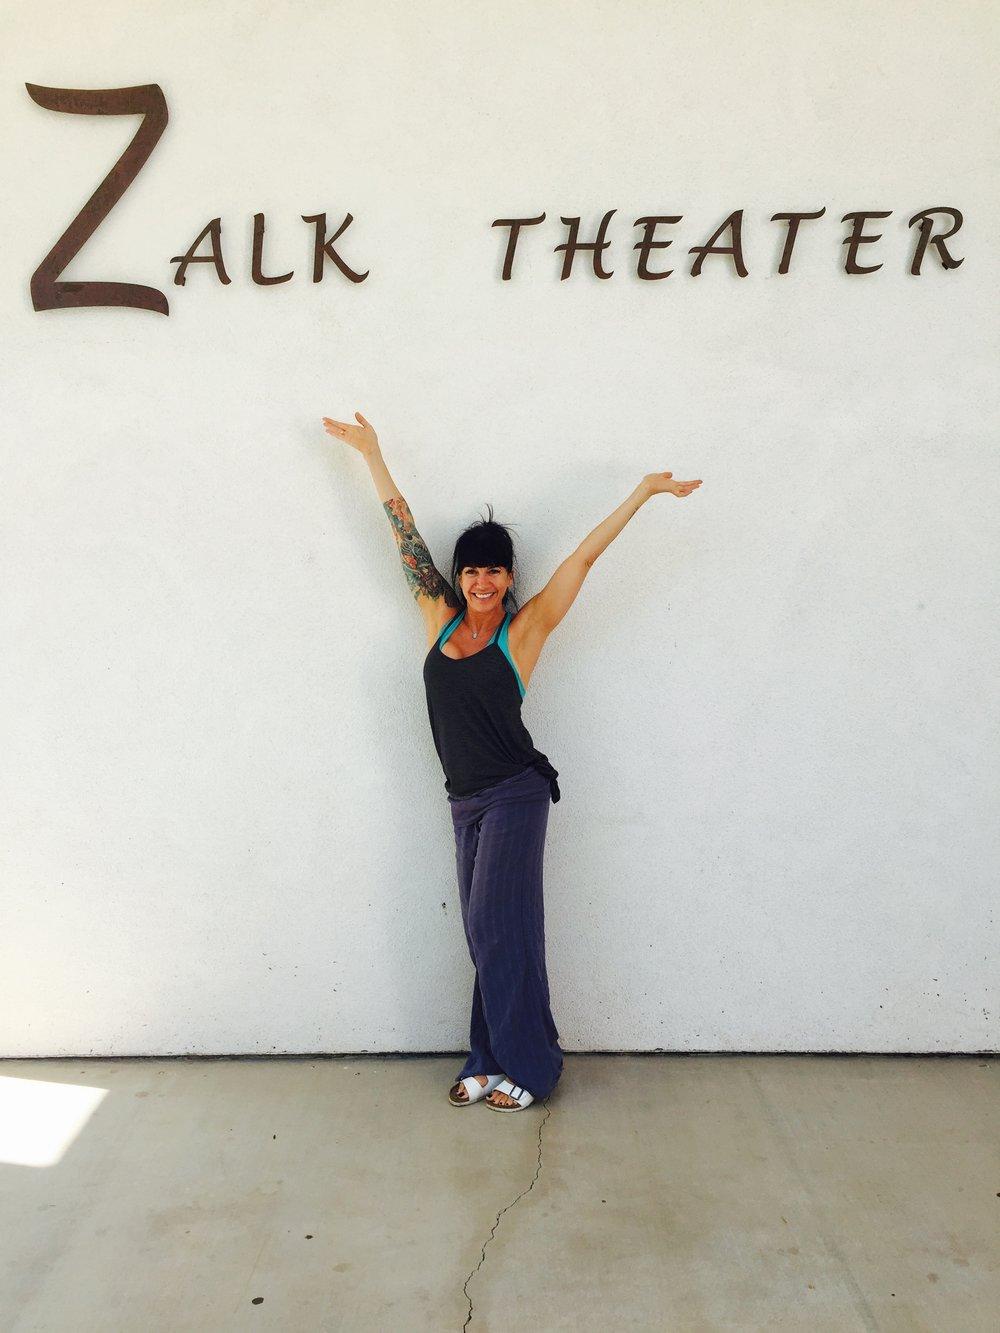 Happy Valley School/ Ojai, Zalk Theater.